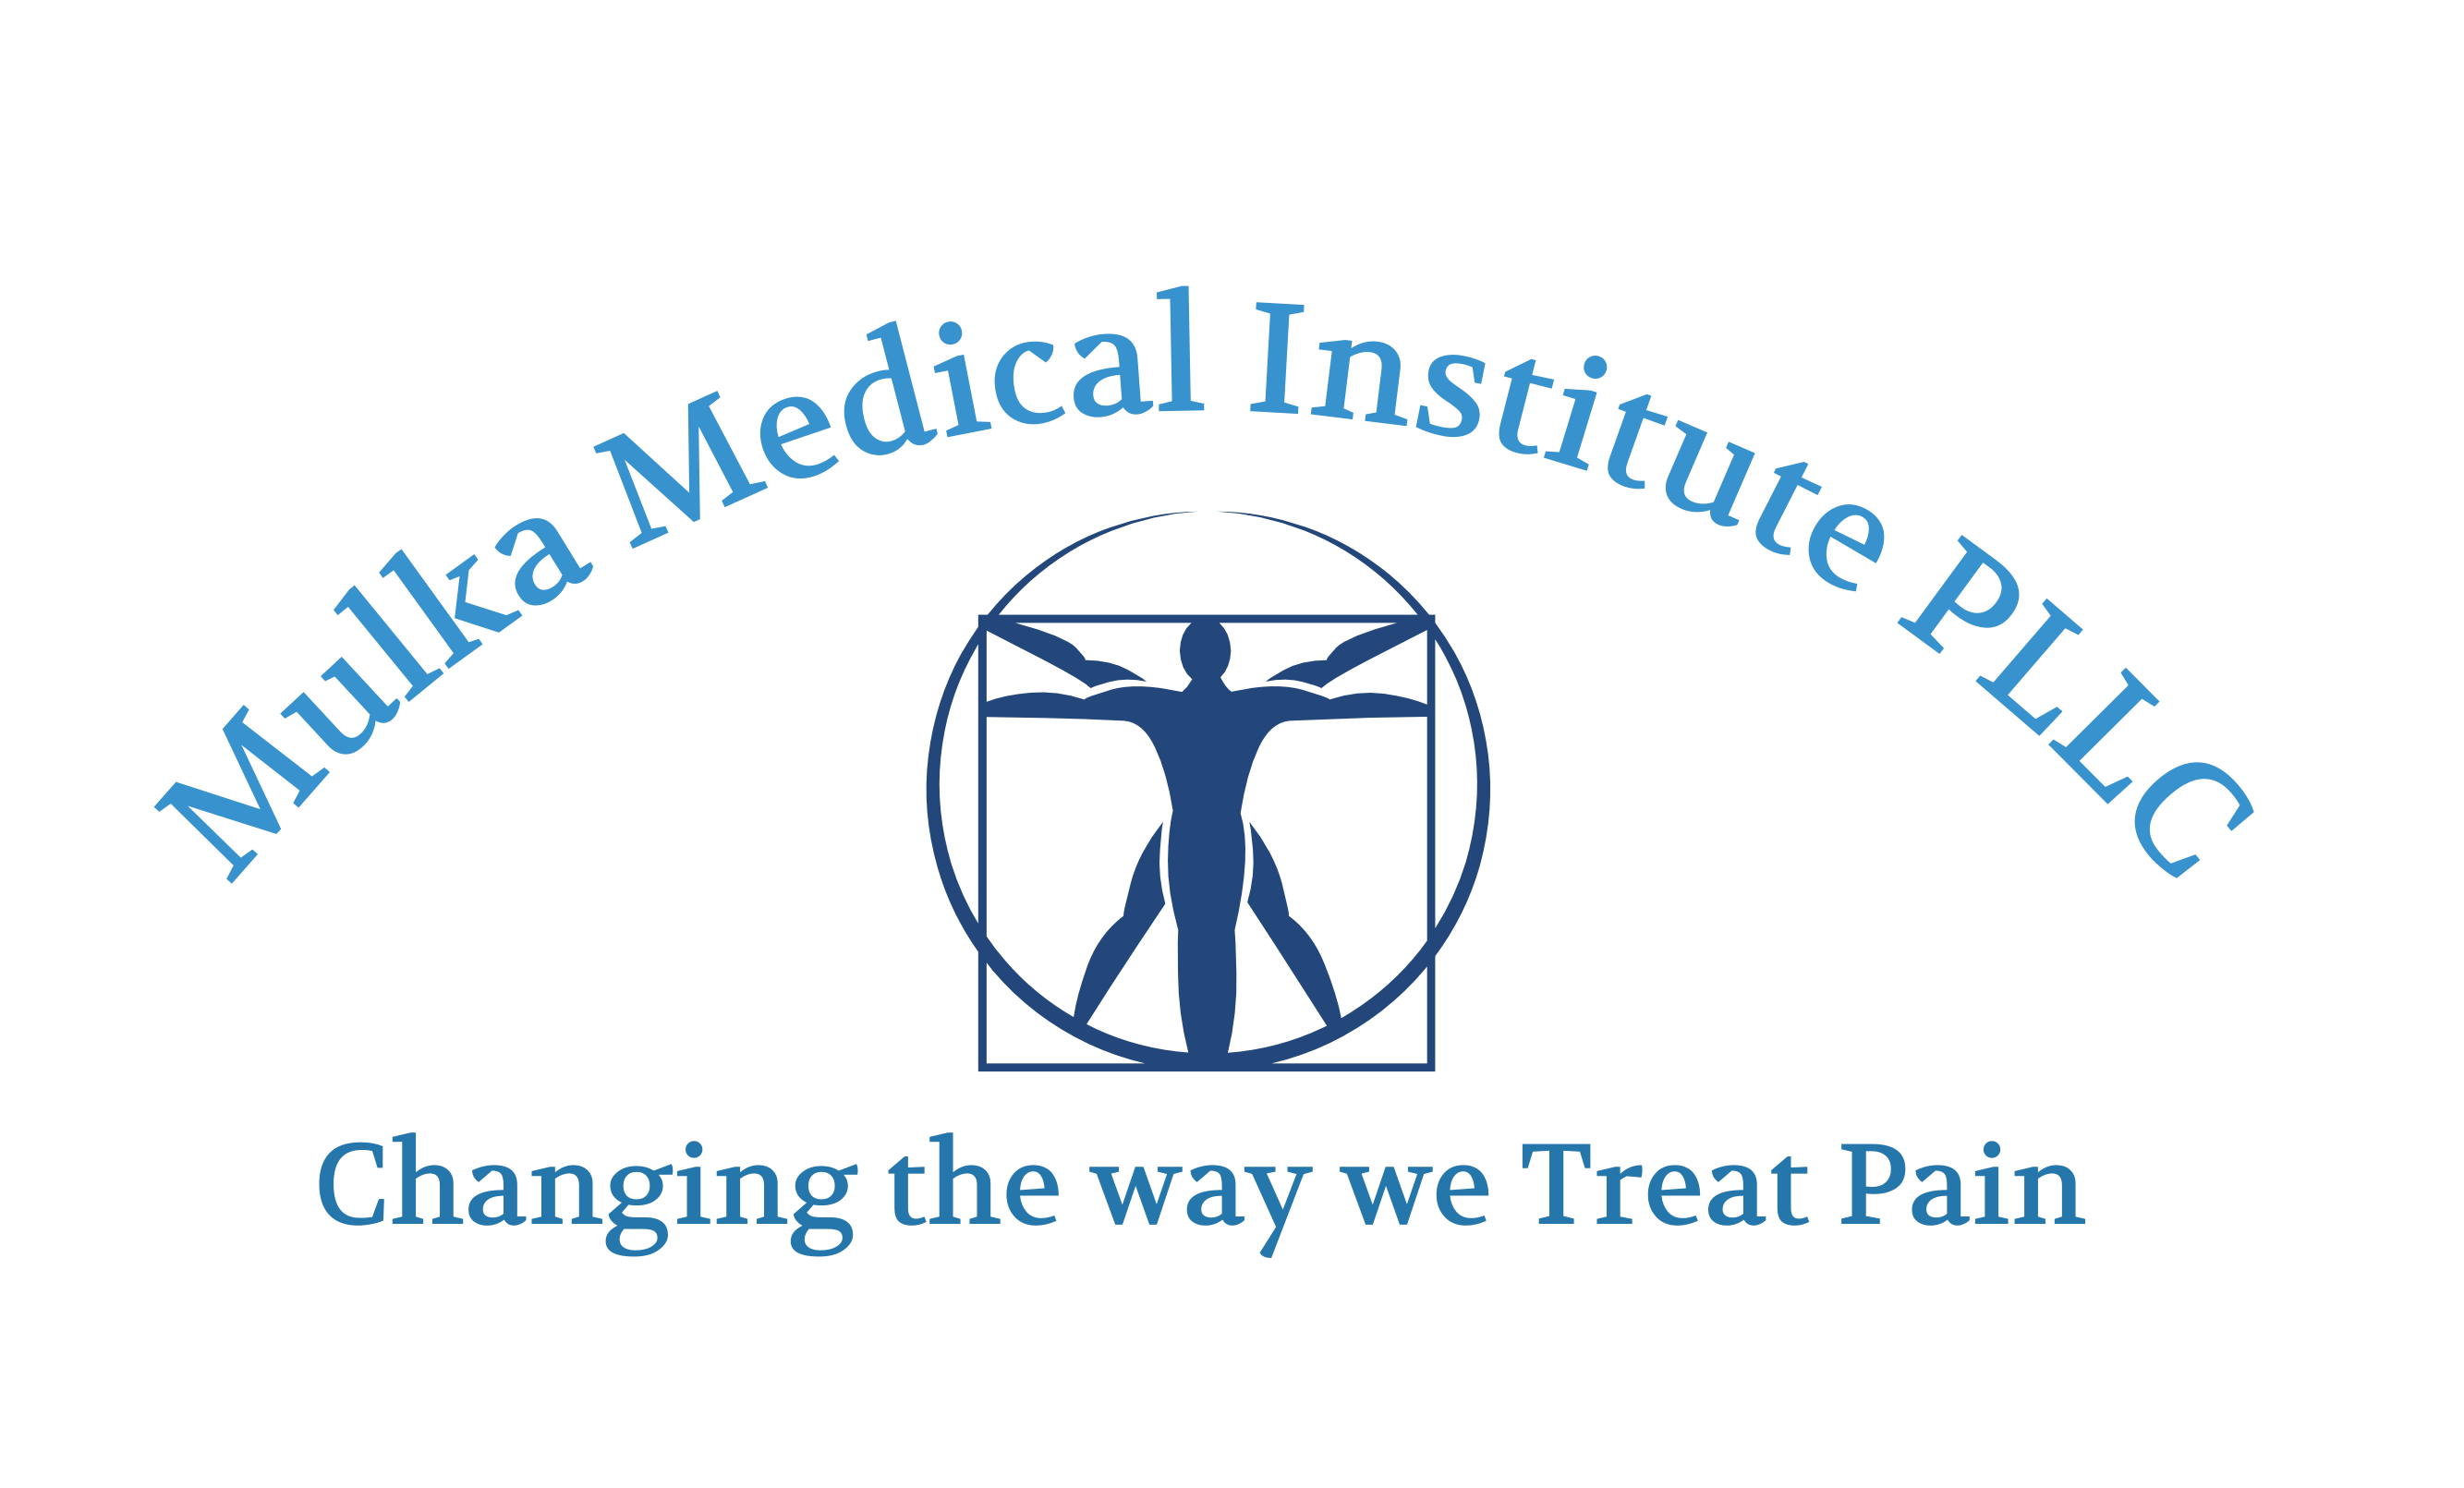 mulka medical institute logo